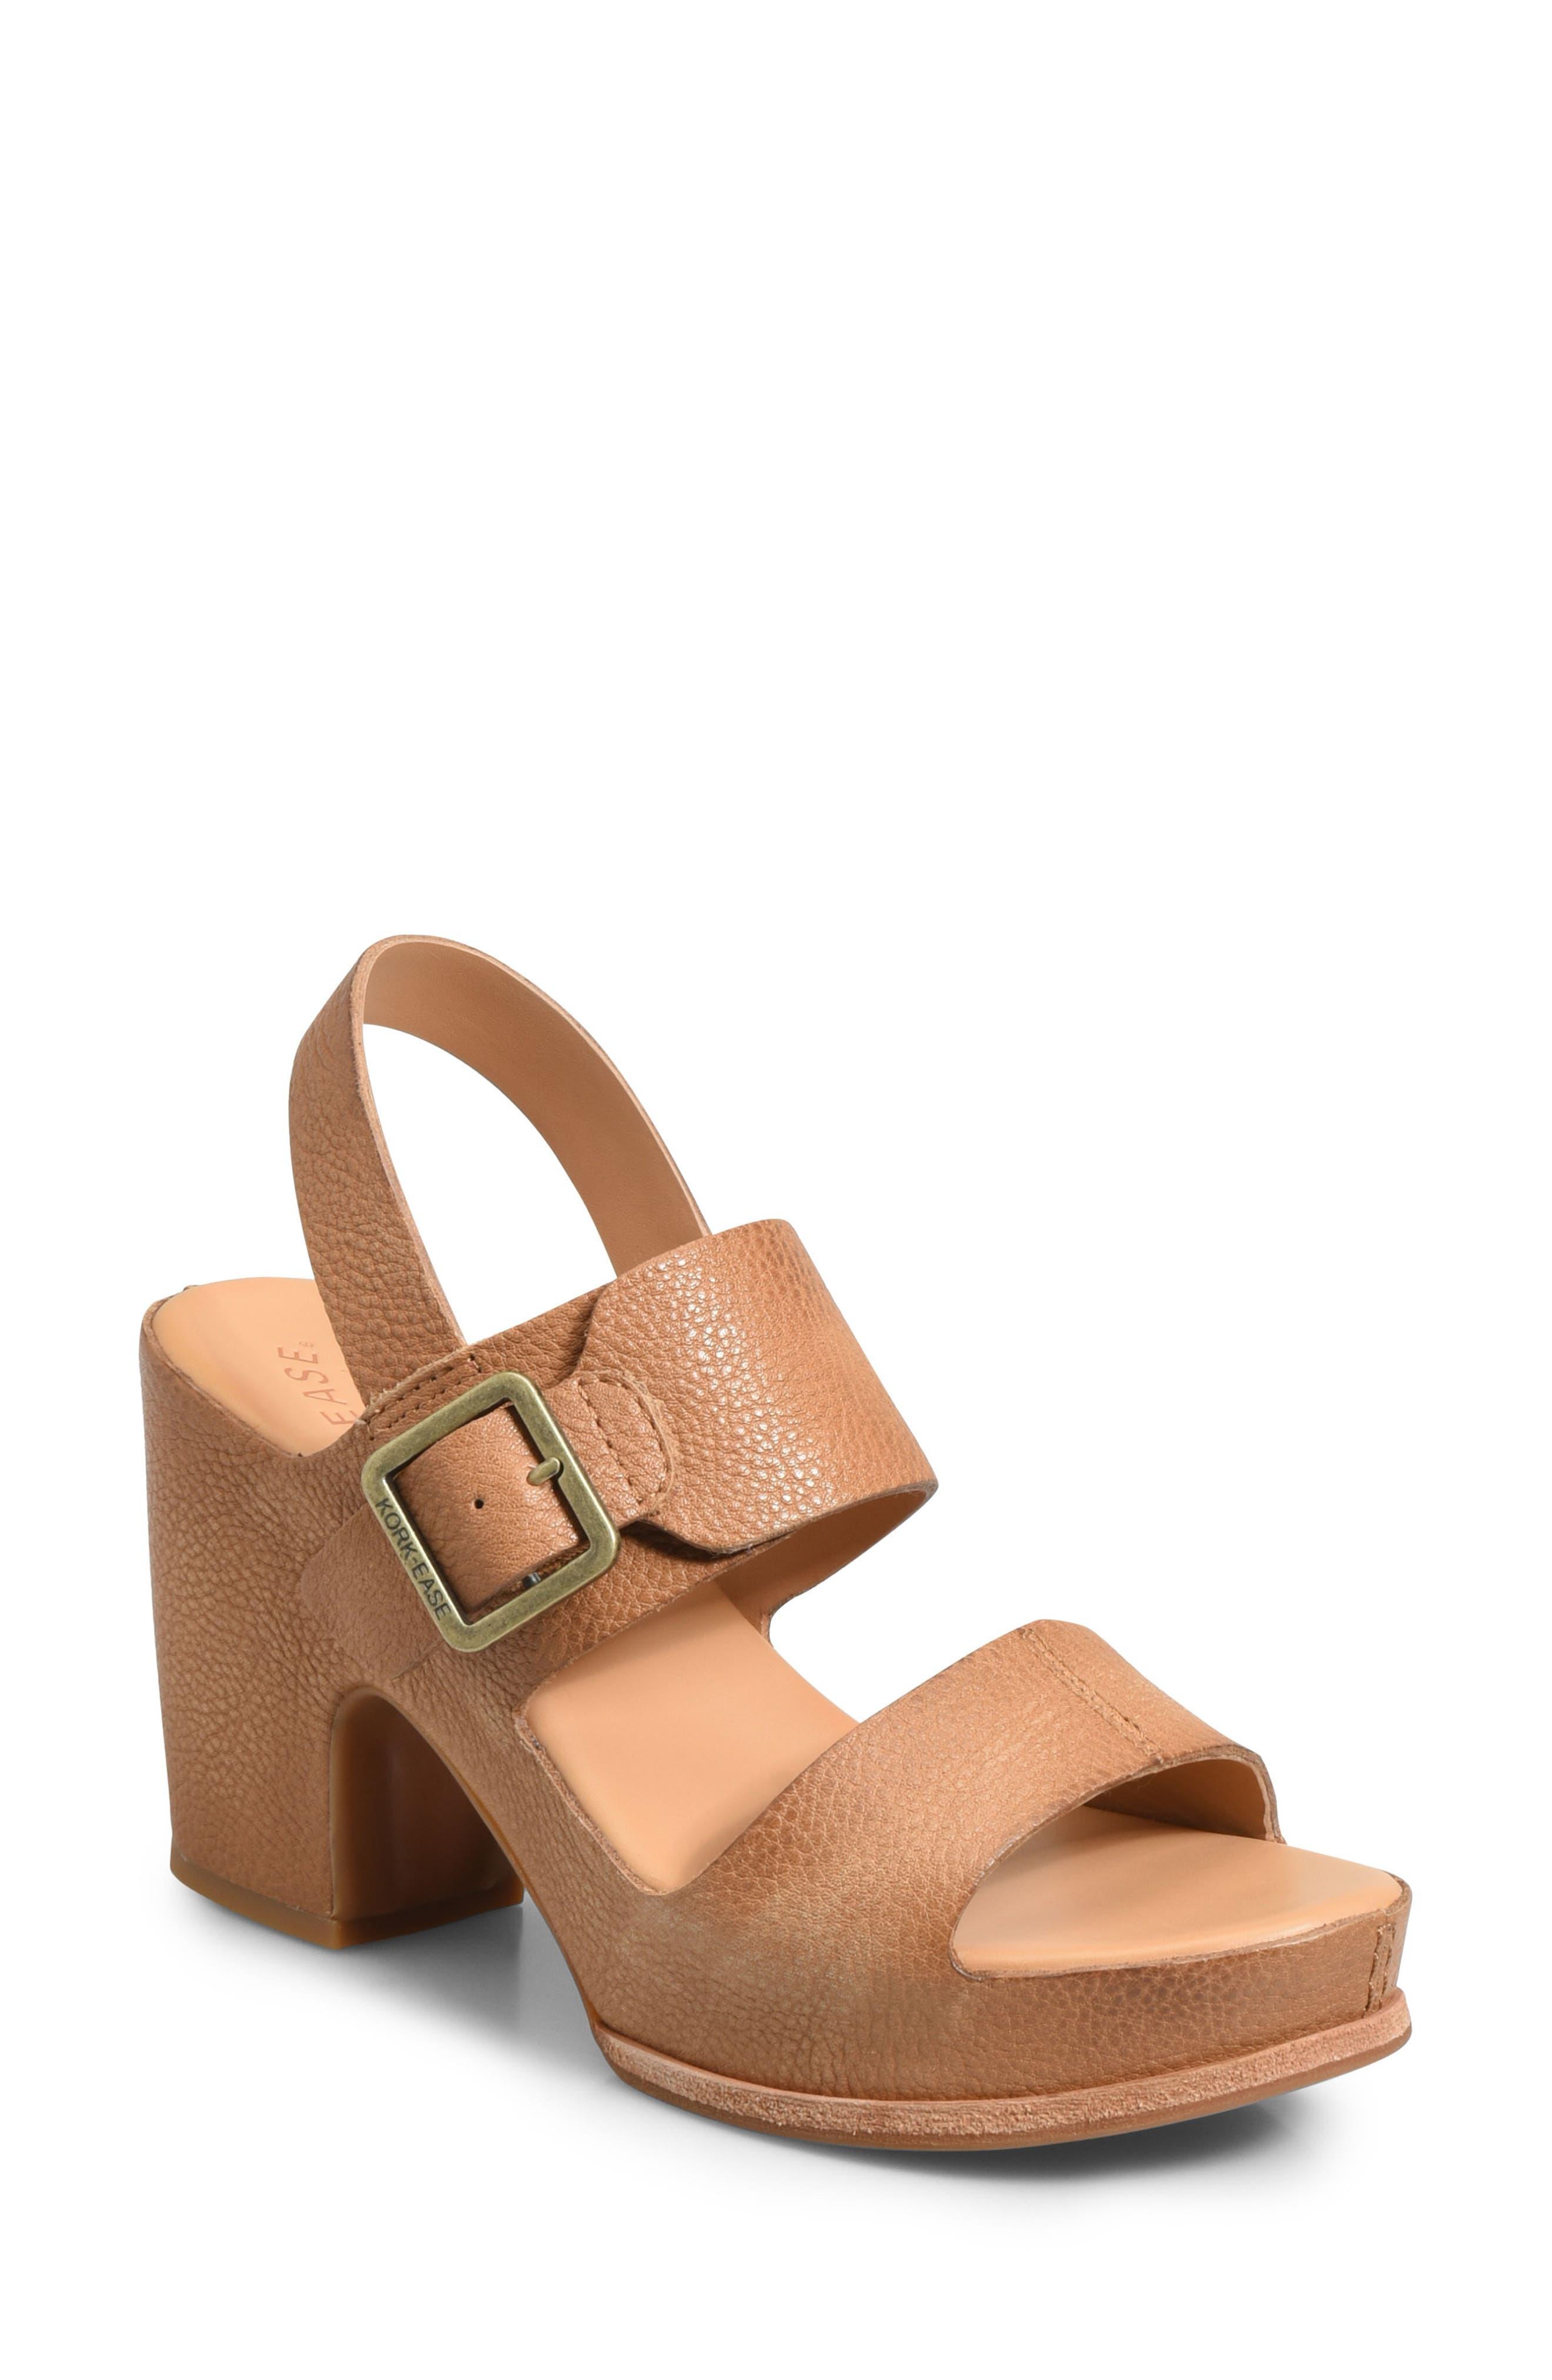 Alternate Image 1 Selected - Kork-Ease® San Carlos Platform Sandal (Women)